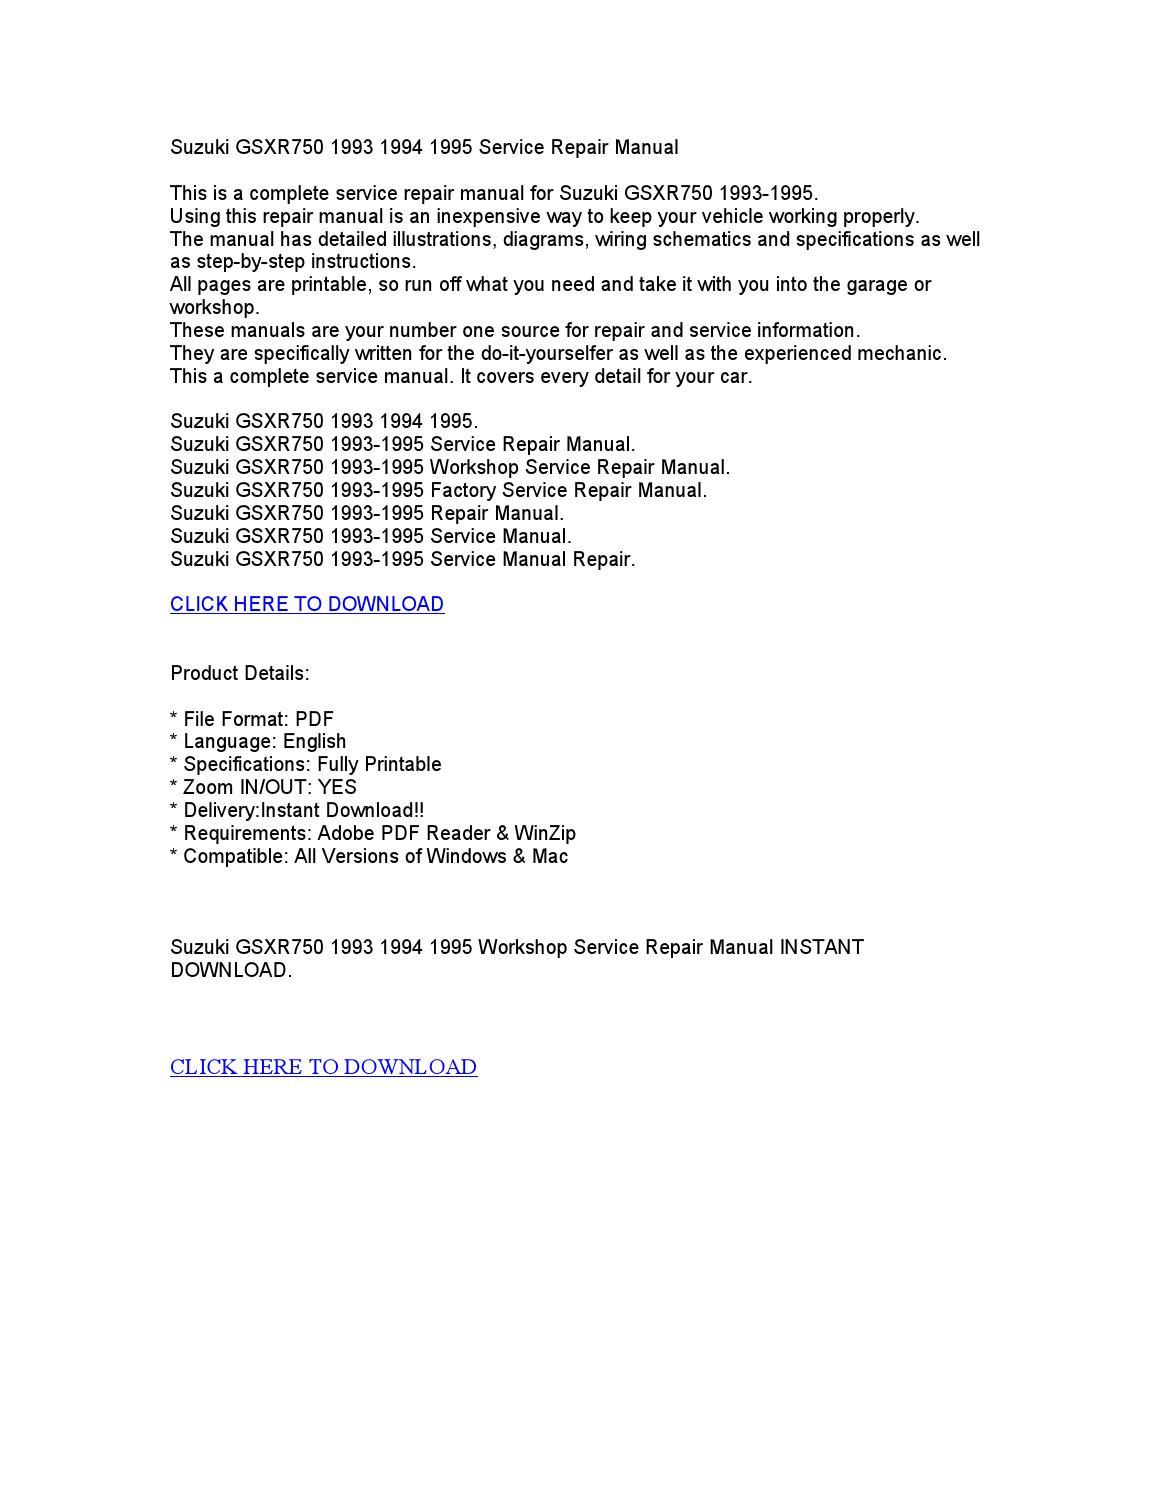 gsxr 750 service manual pdf